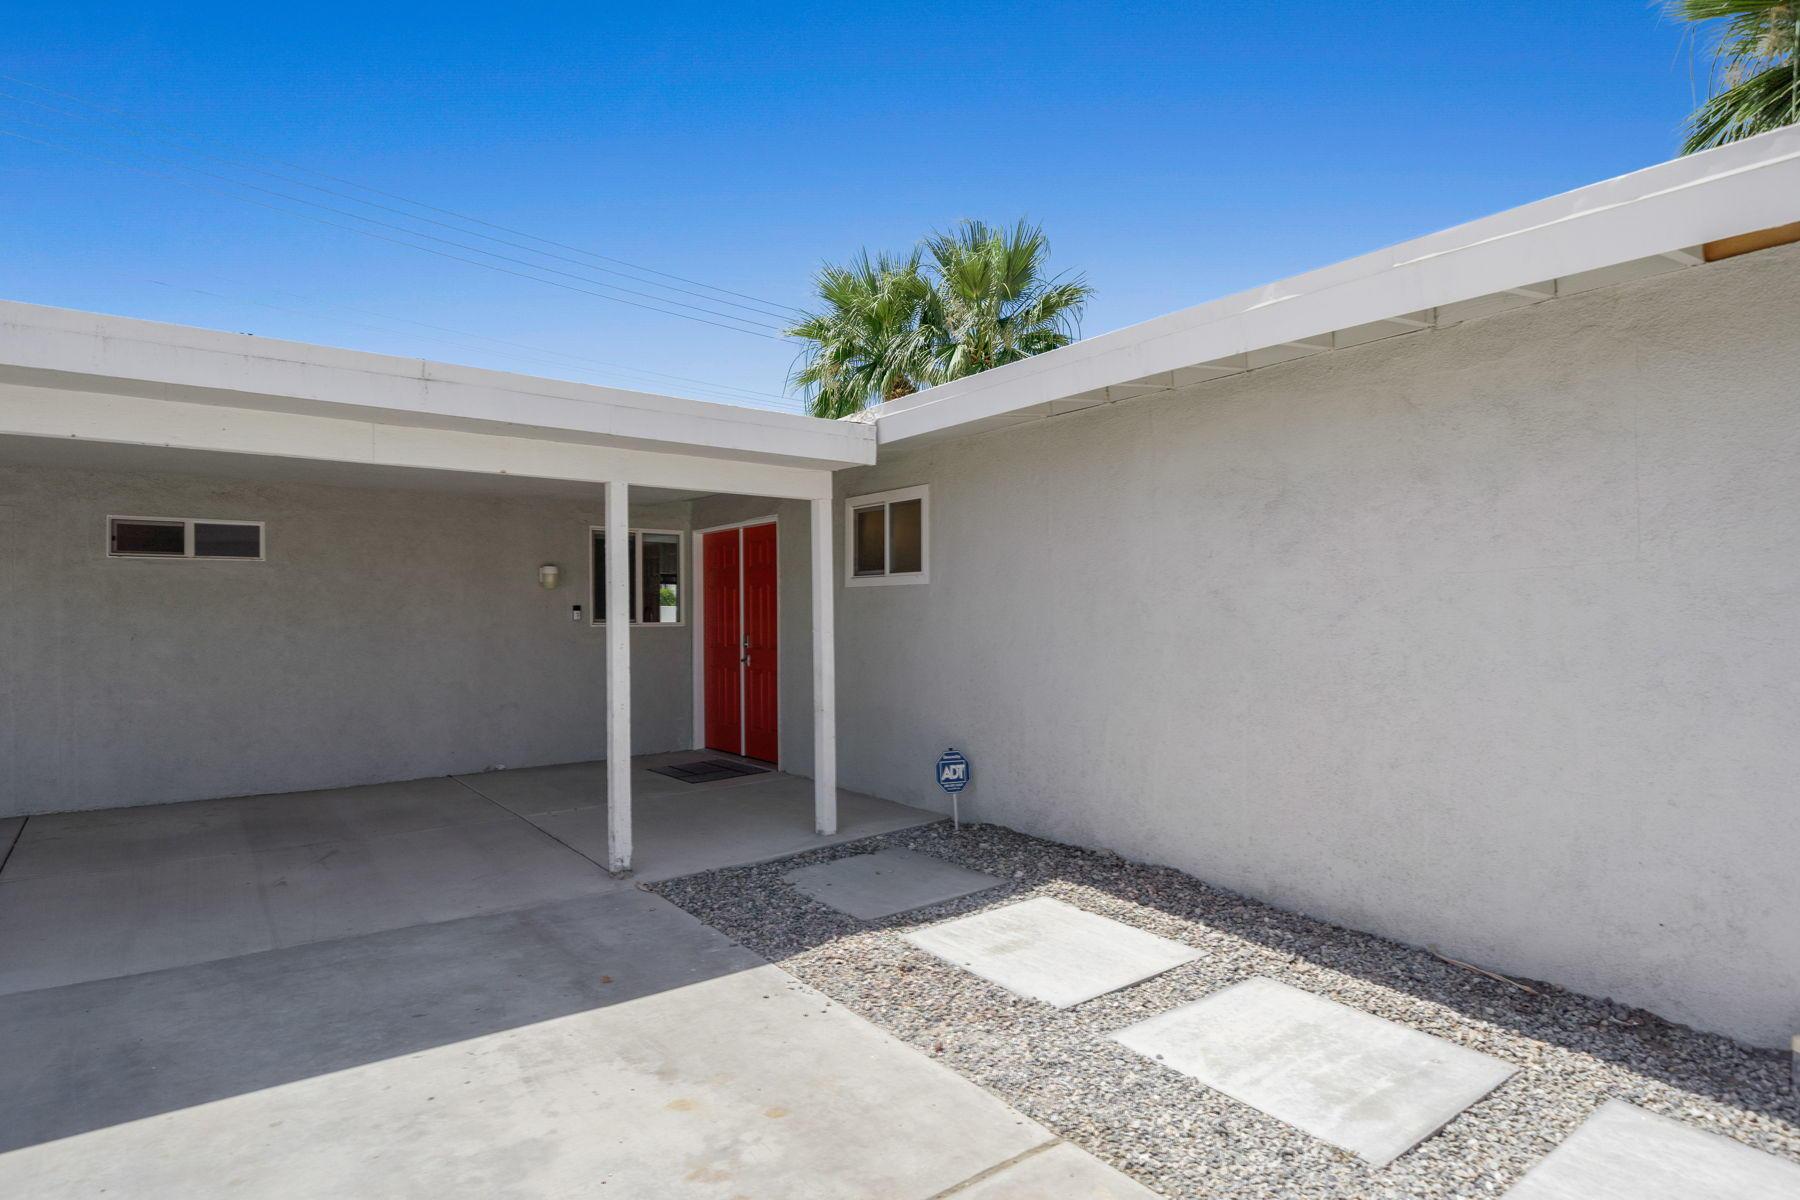 43773 Marigold Drive, Palm Desert, California 92260, 4 Bedrooms Bedrooms, ,3 BathroomsBathrooms,Residential,For Sale,43773 Marigold Drive,219045515